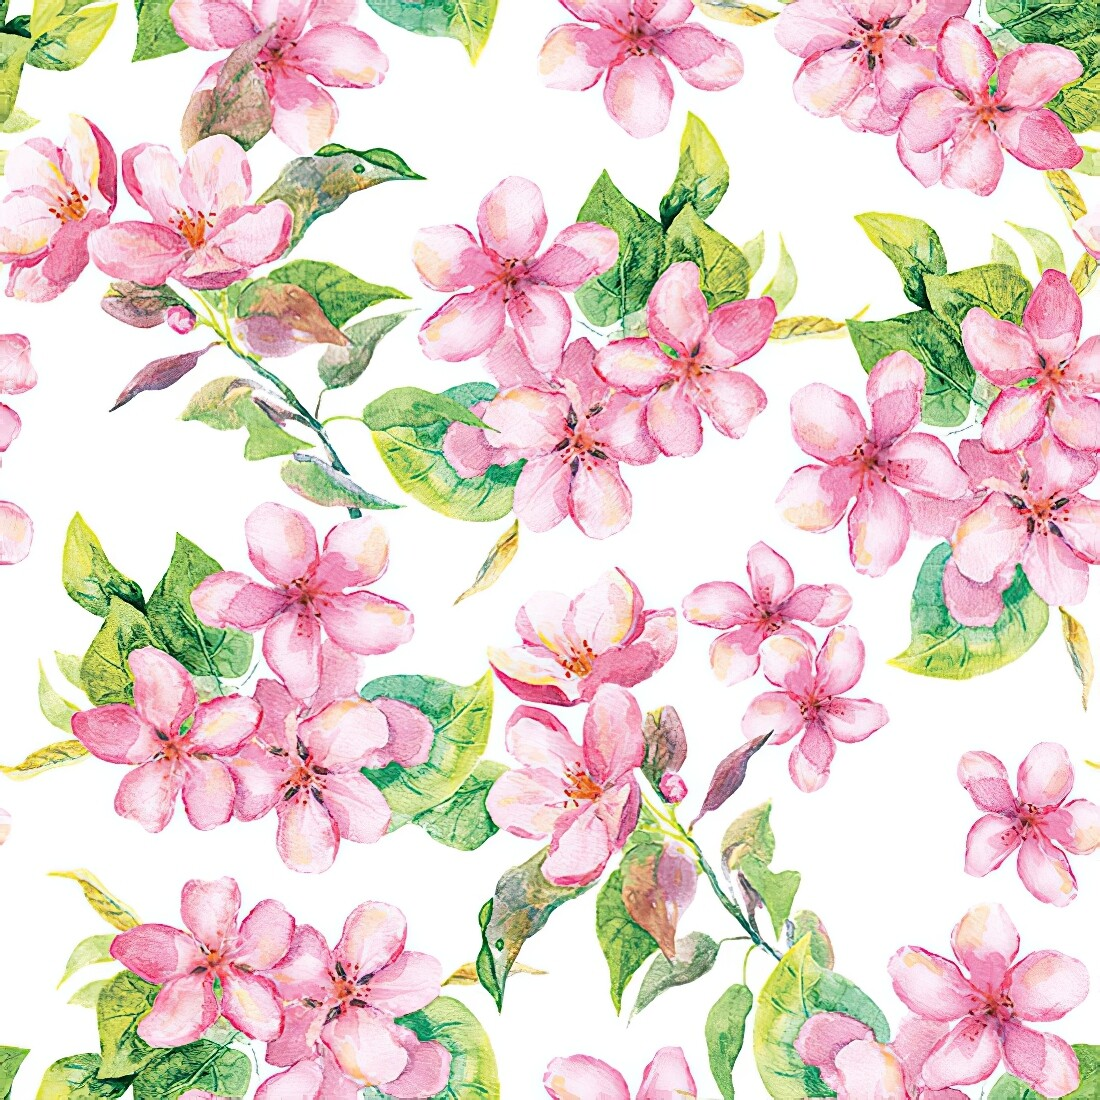 Decoupage Paper Napkins - Floral - Cherry Blossom (1 Sheet)